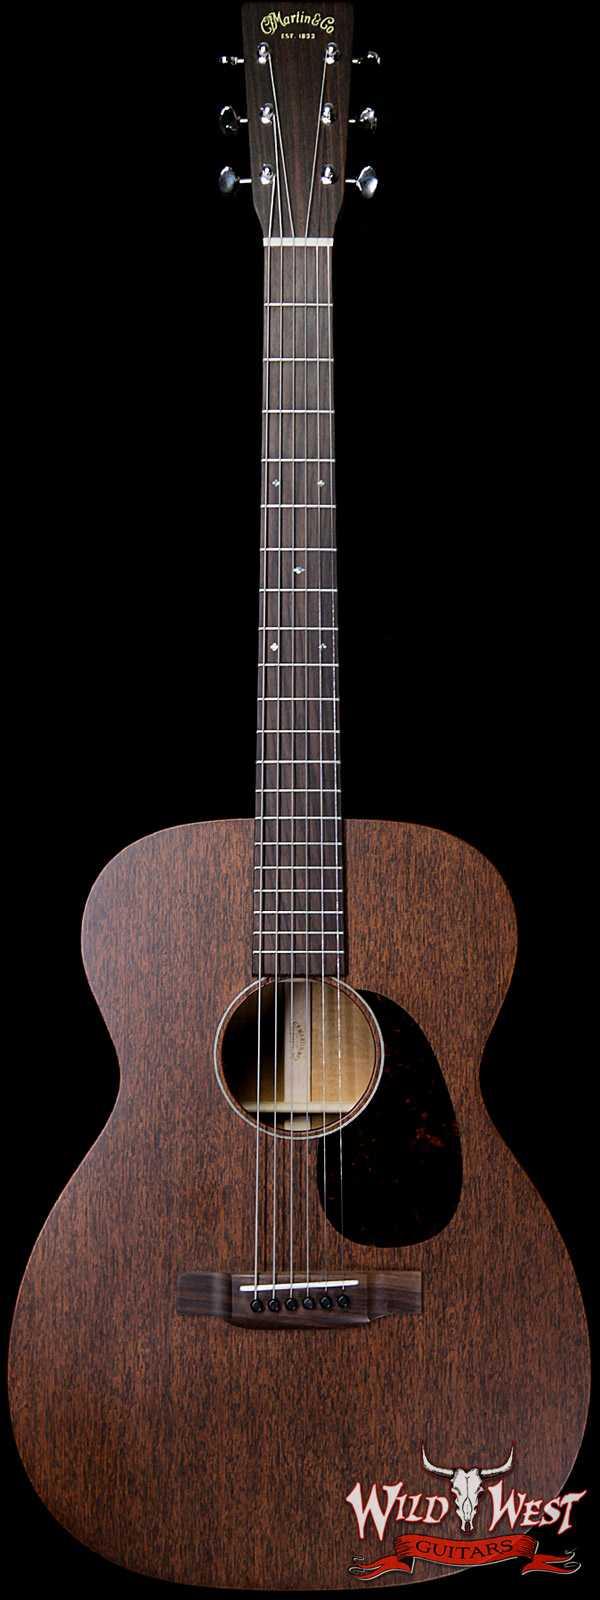 2019 Martin USA 15 Series 000-15M Electric-Acoustic Guitar  Dark Mahogany with Gig Bag